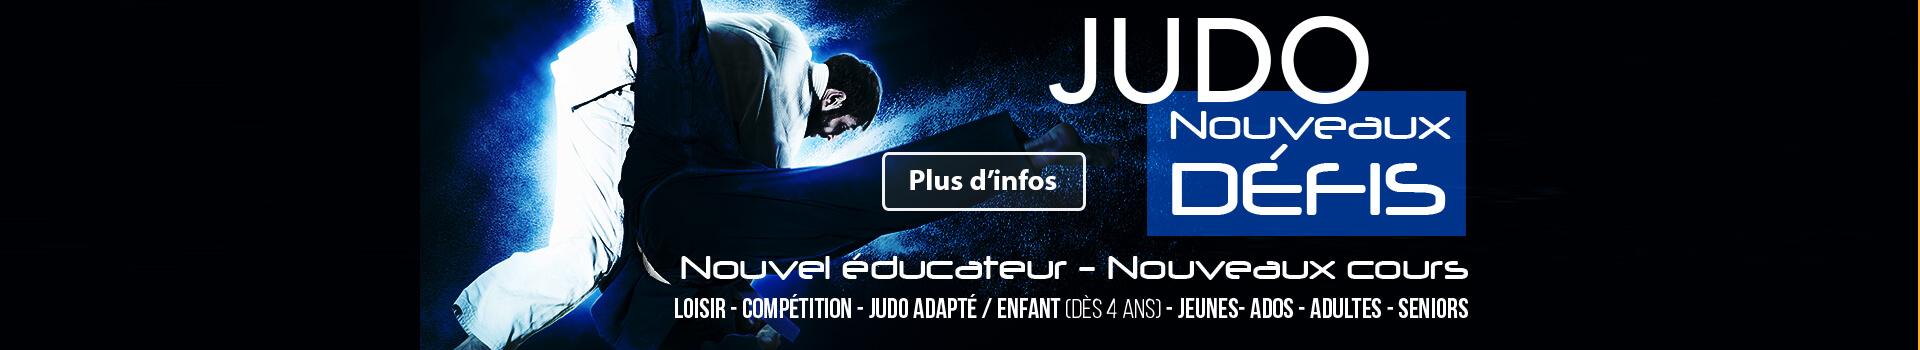 bandeau_judo_rentree2019_D